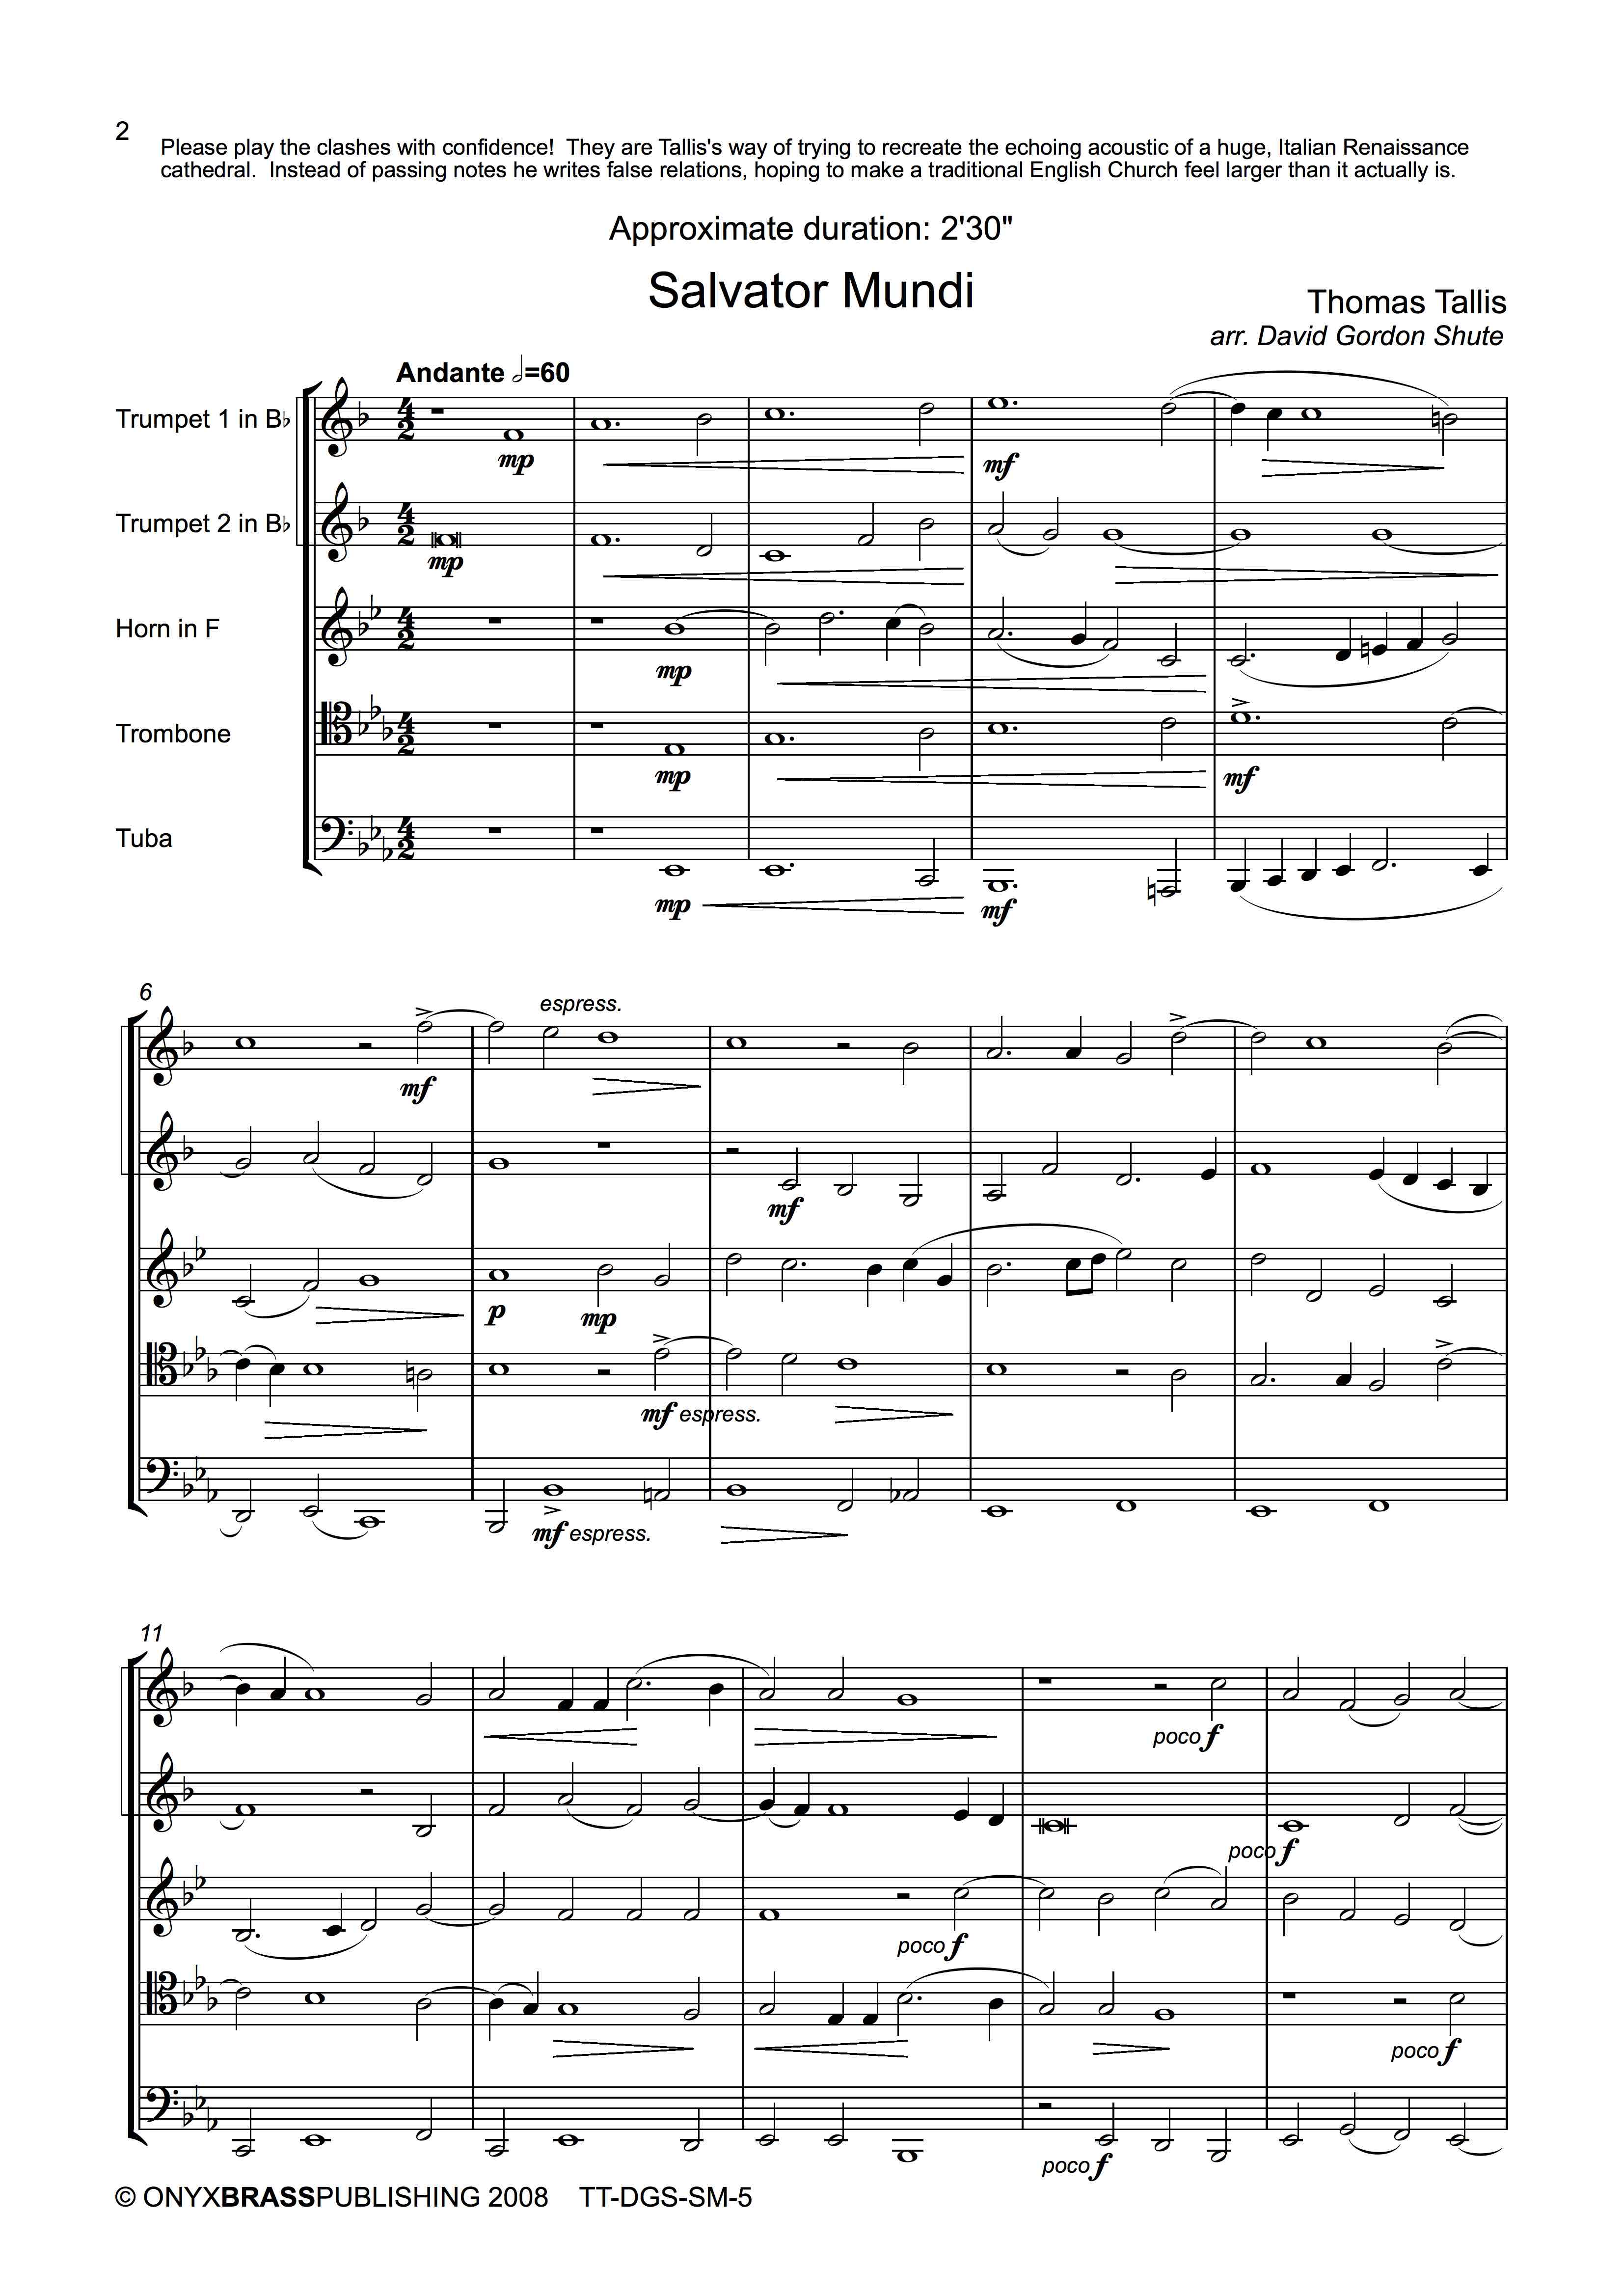 Salvator Mundi - example page